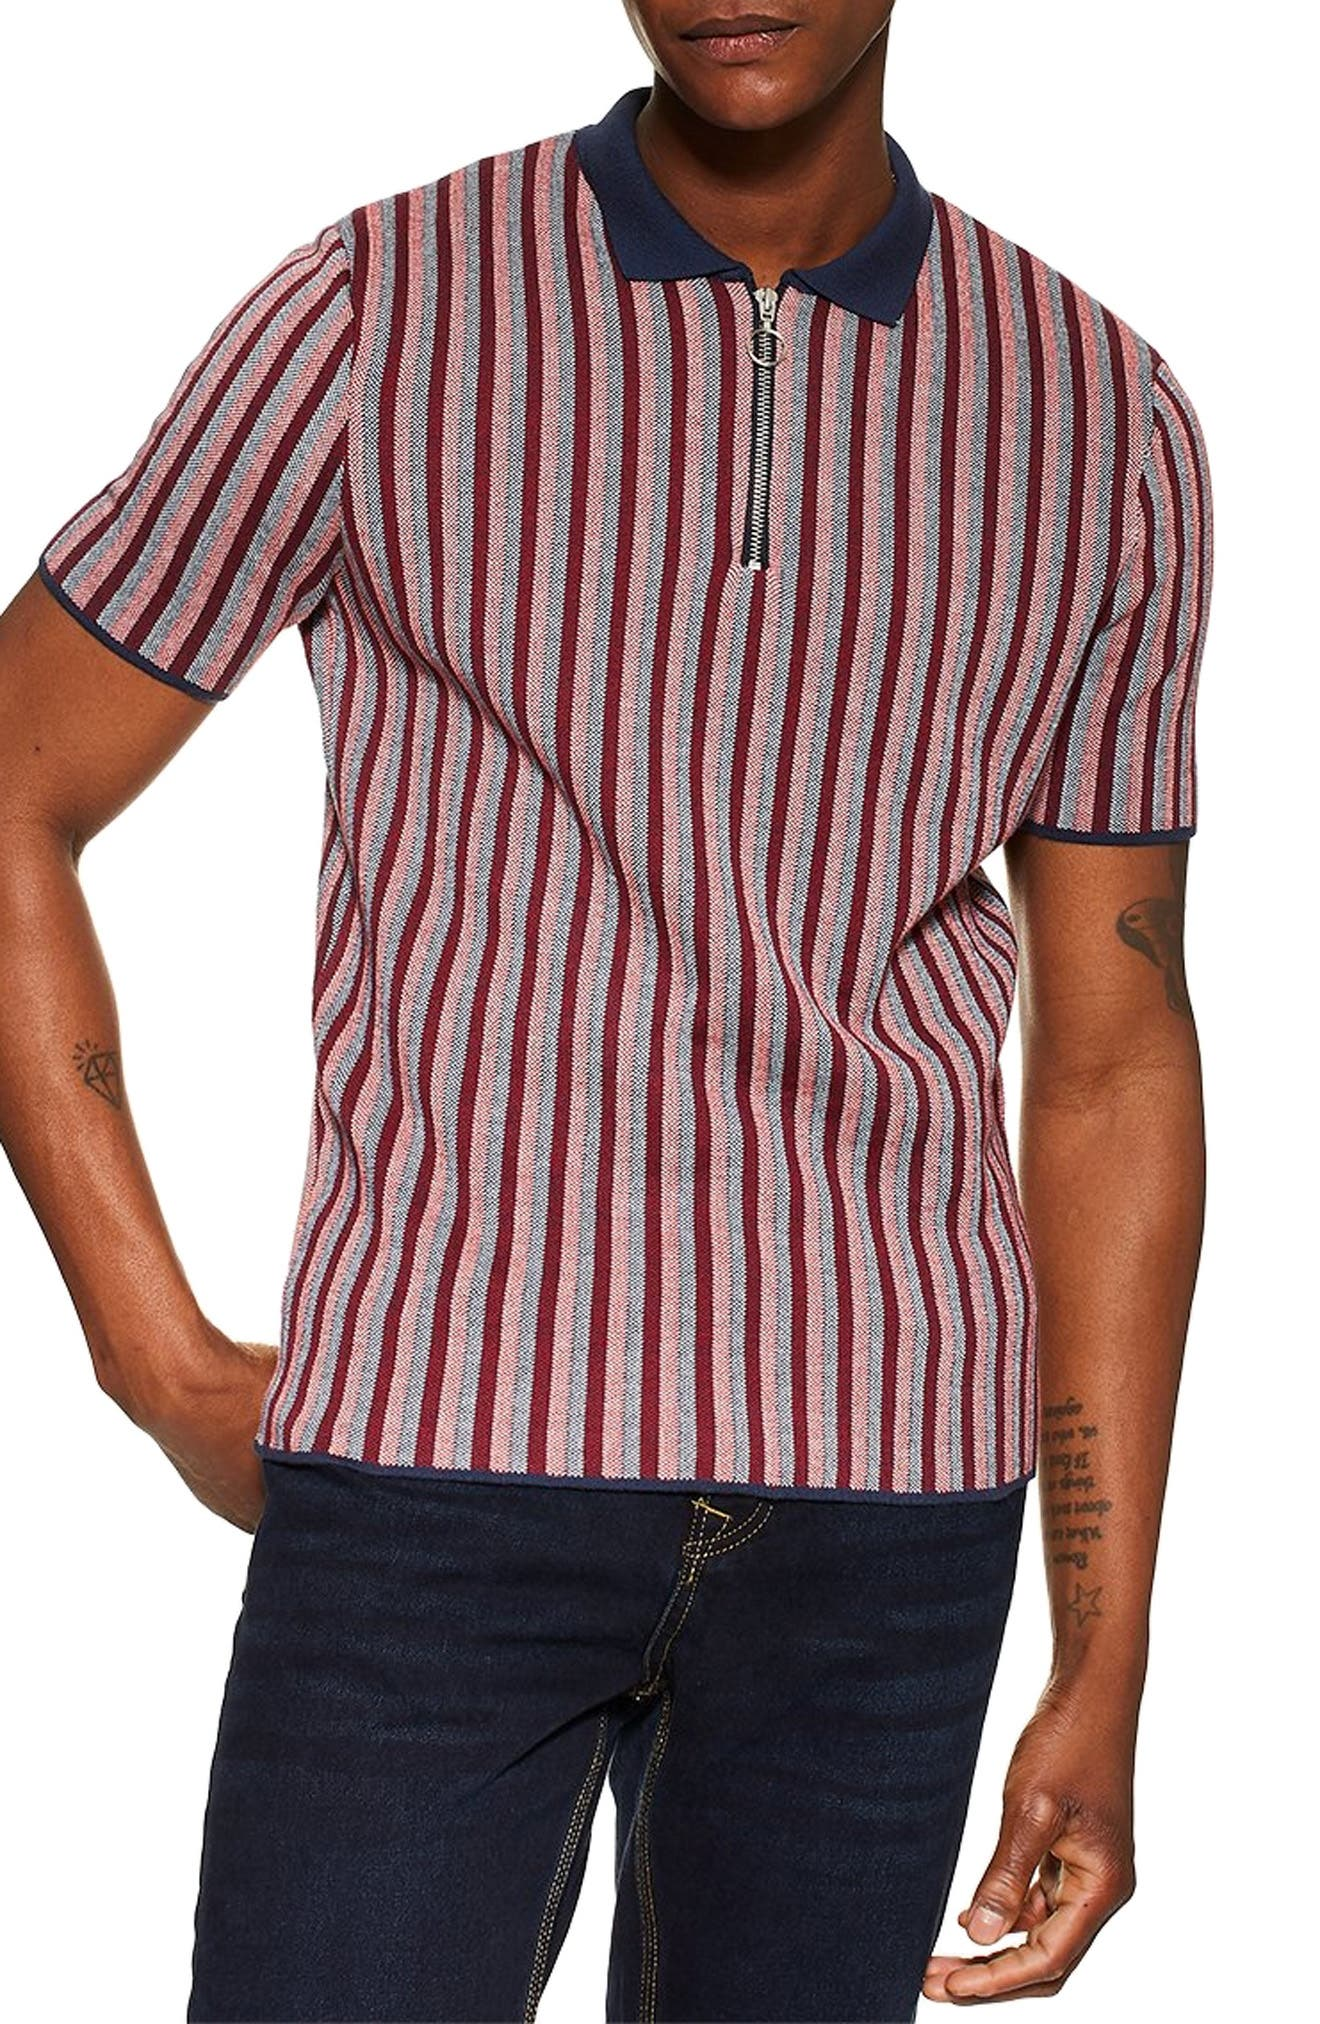 1960s Men's Clothing, 70s Men's Fashion Mens Topman Birds Eye Stripe Polo $29.98 AT vintagedancer.com